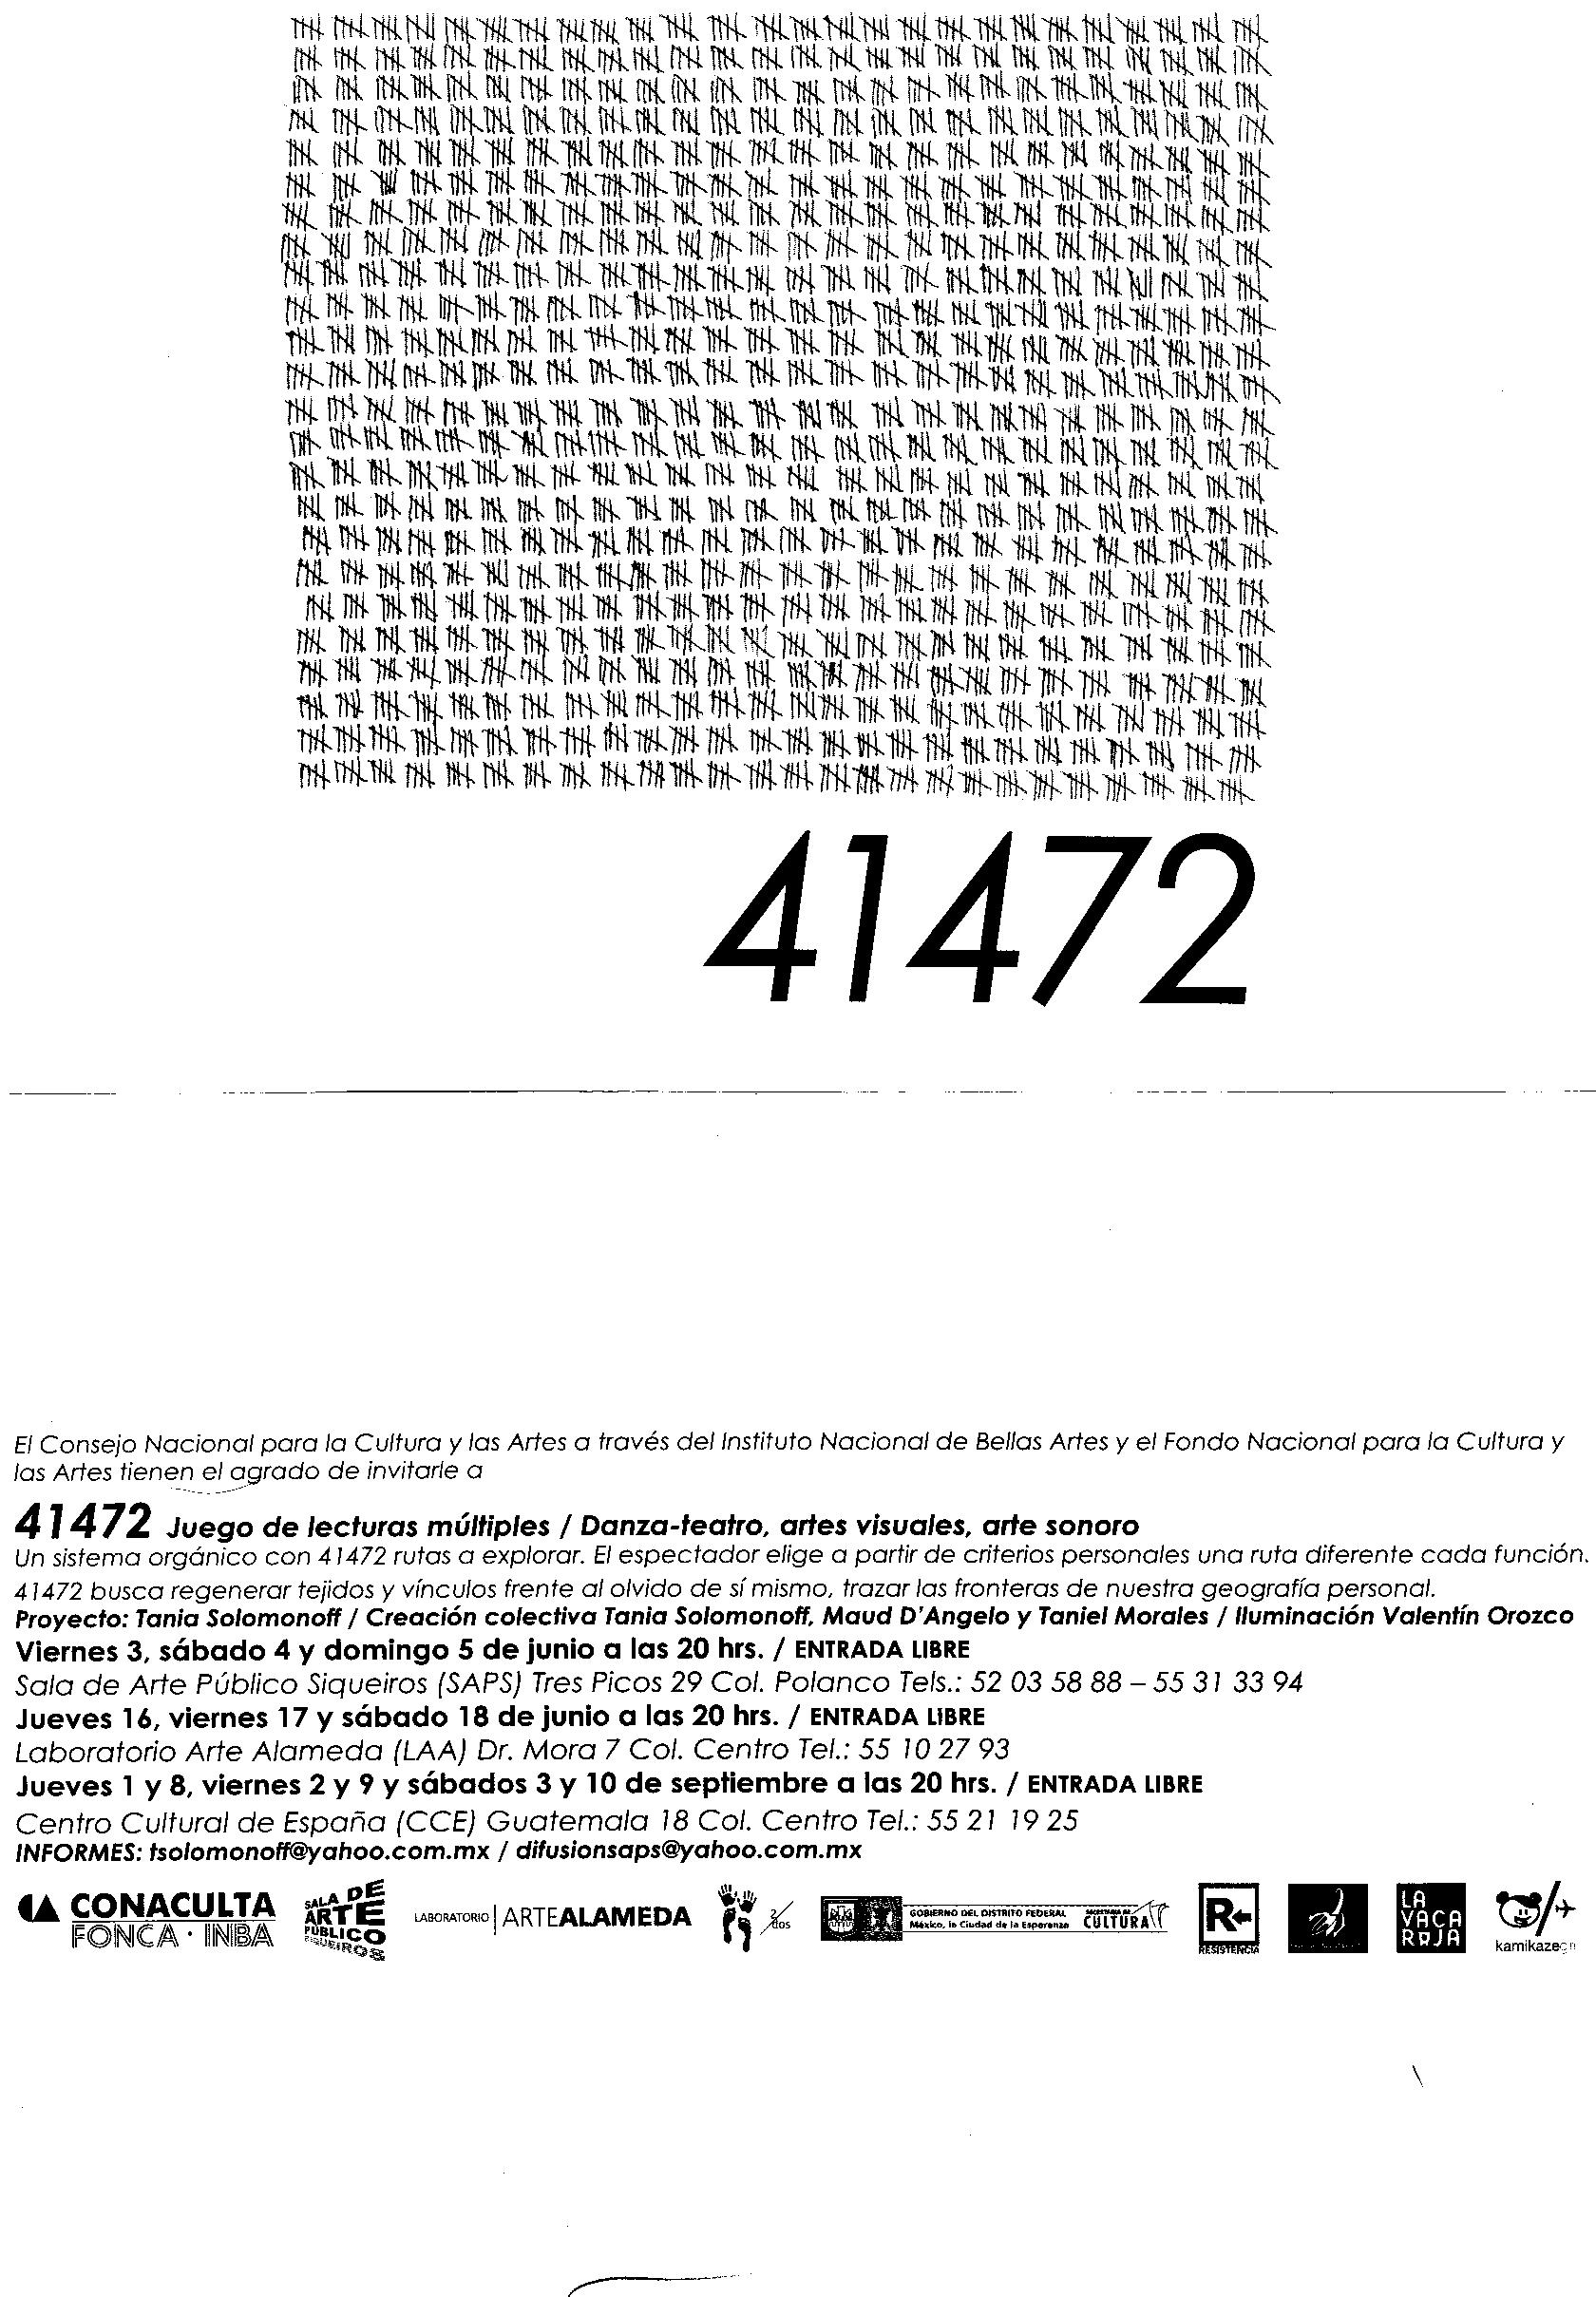 41472_postal.jpg